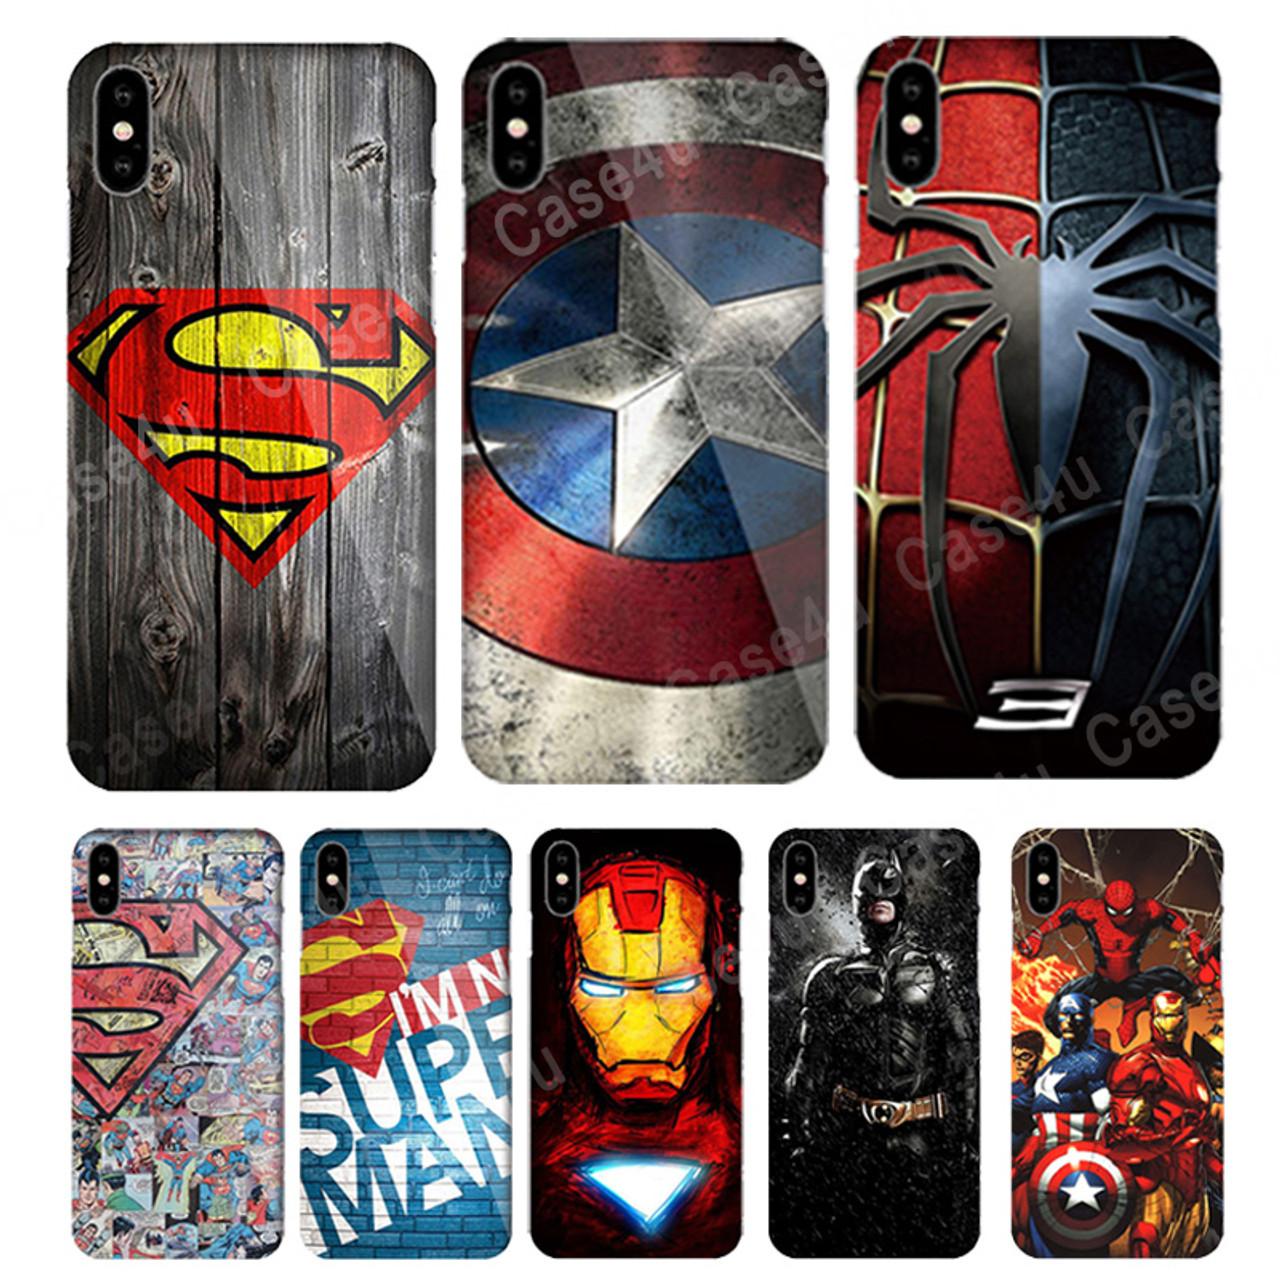 50f15004bf9 ... Marvel Captain America Shield Superhero Case Cover for iPhone X 7 8 Plus  6 6s iPhoneX ...